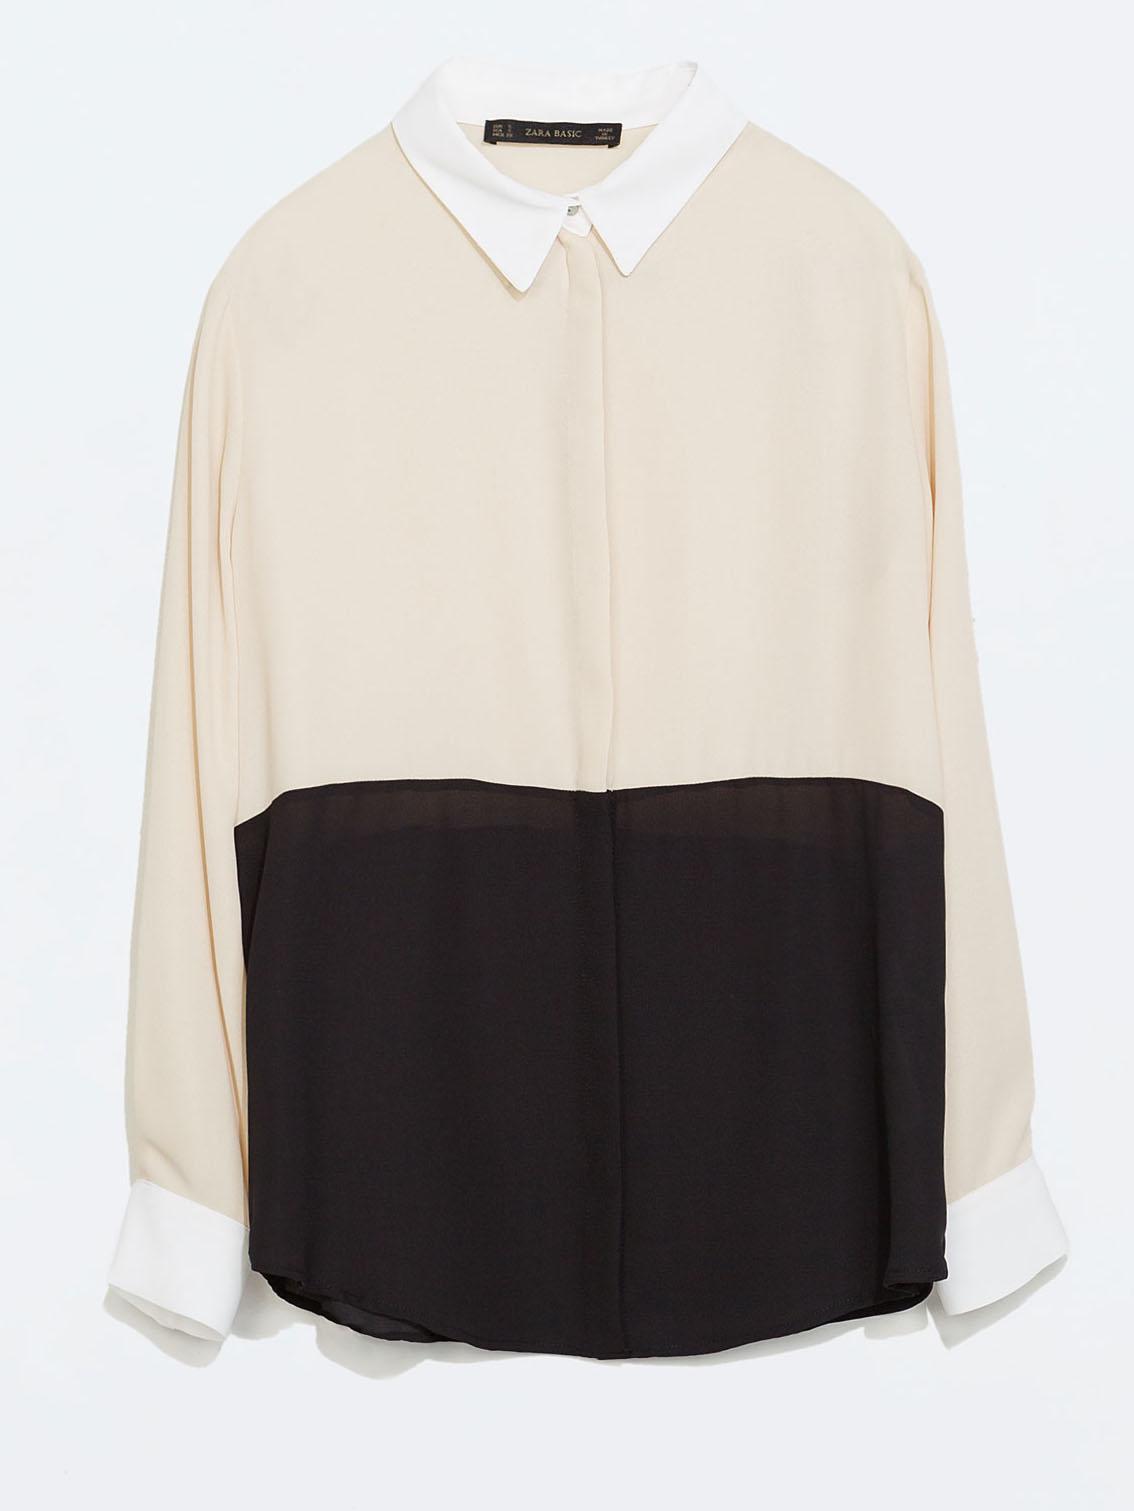 Chemise bicolore Zara, 29,95€